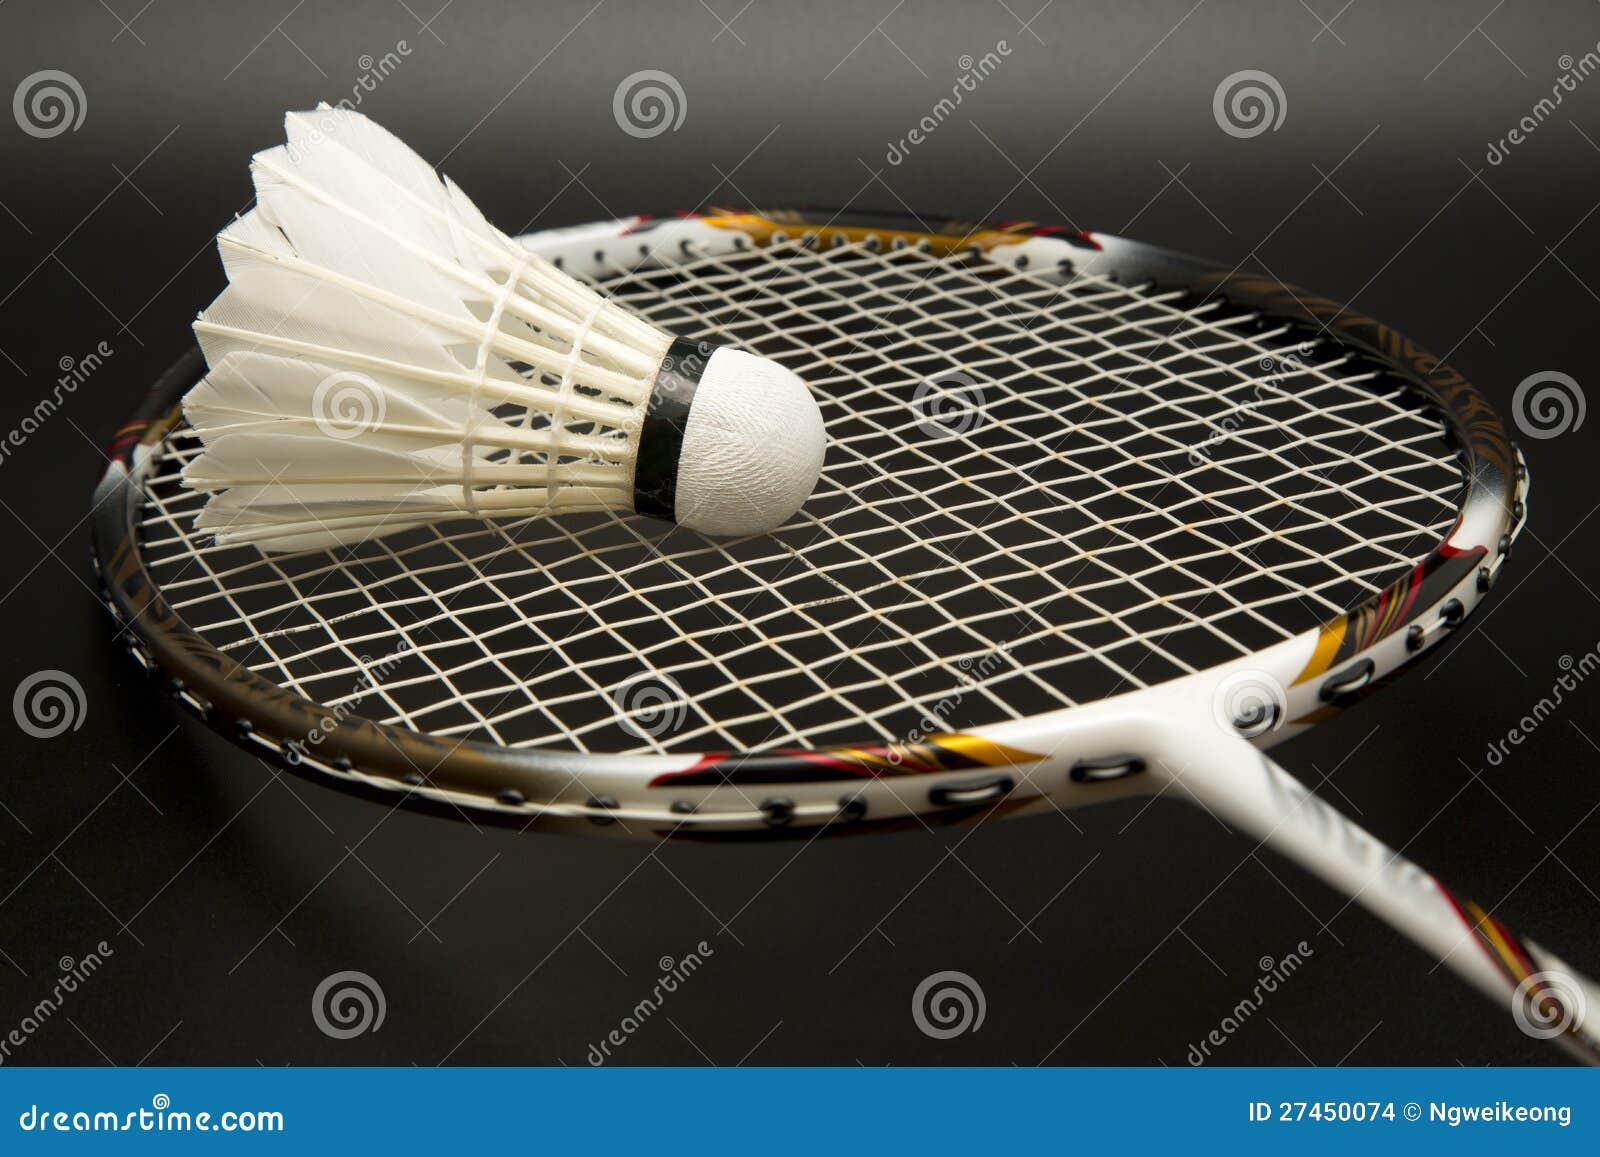 羽毛球球拍和shuttlecock